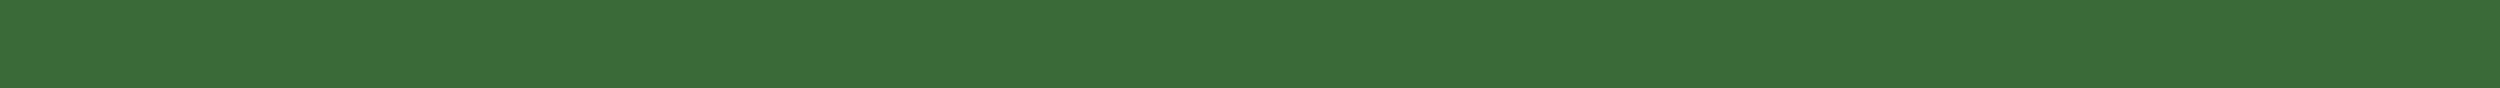 green bar separator.jpg